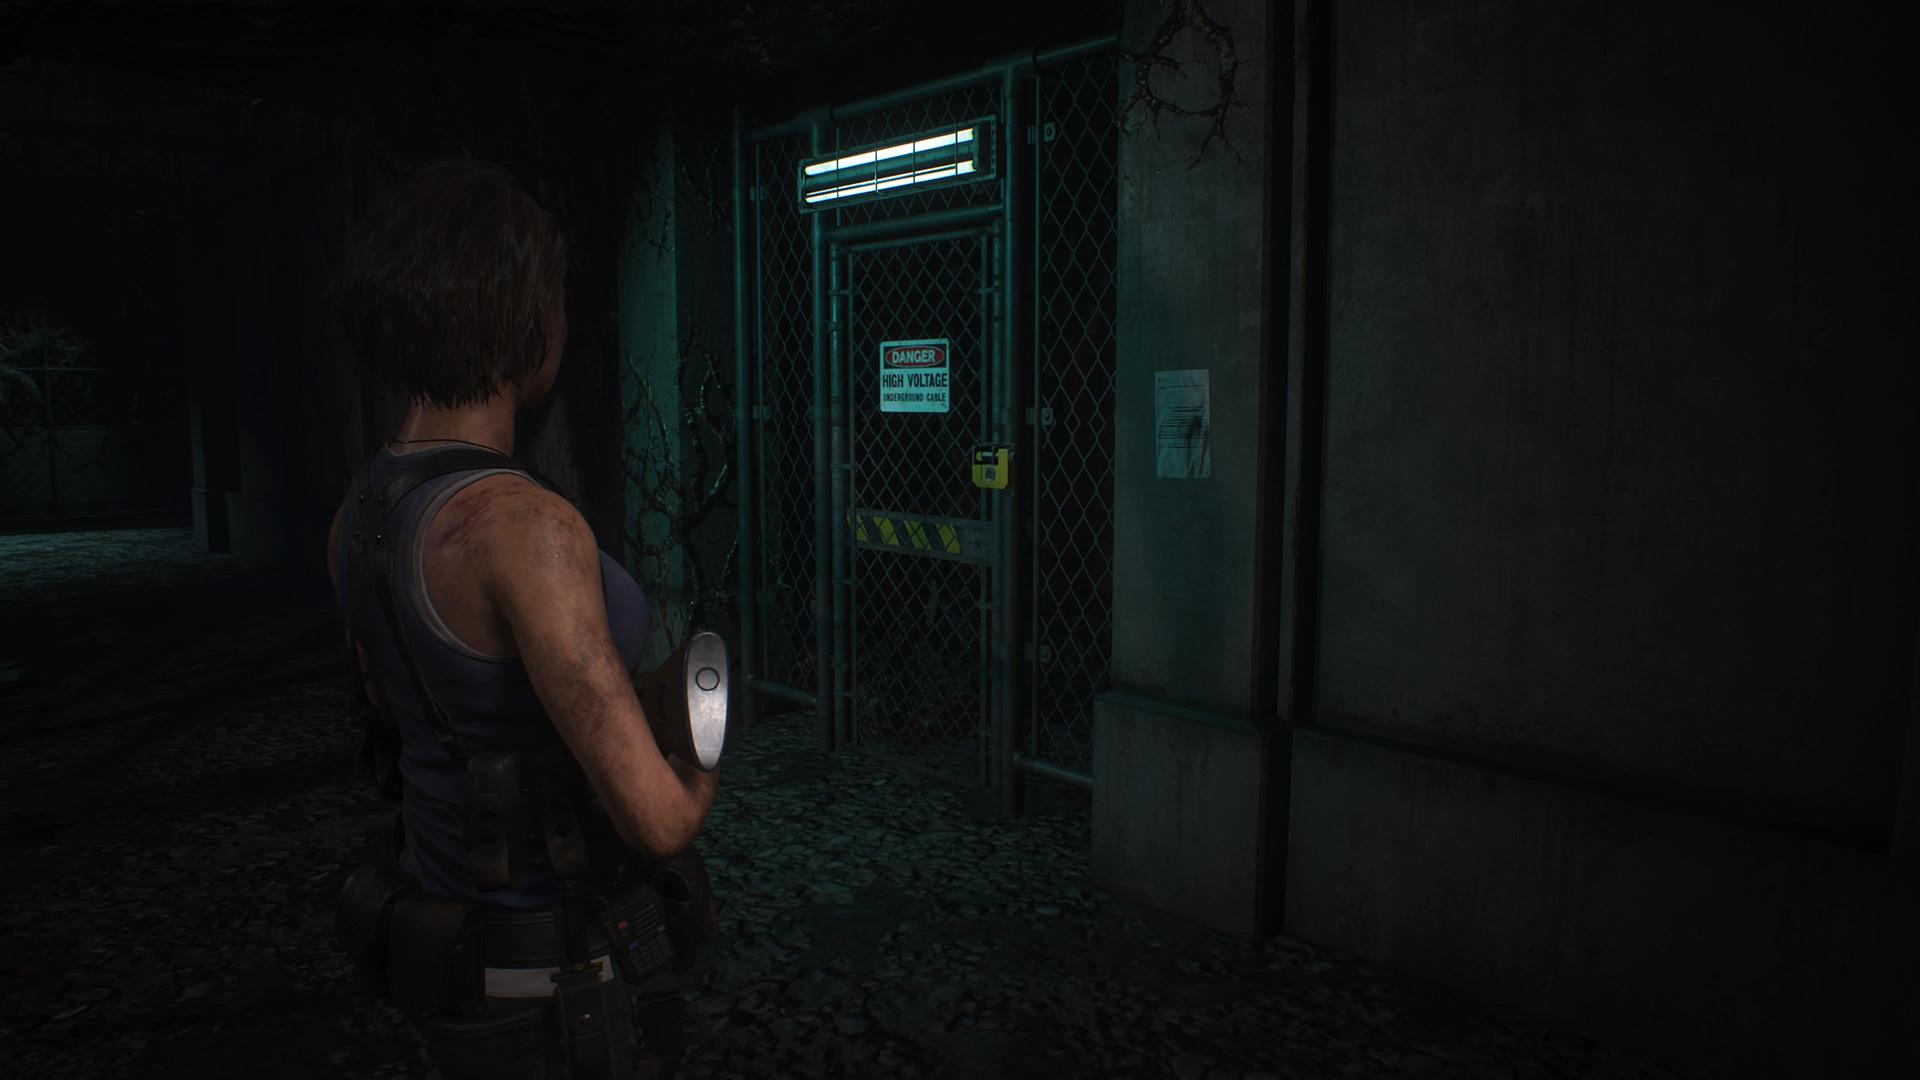 You can easily farm Resident Evil 3 unlocks at the substation screenshot